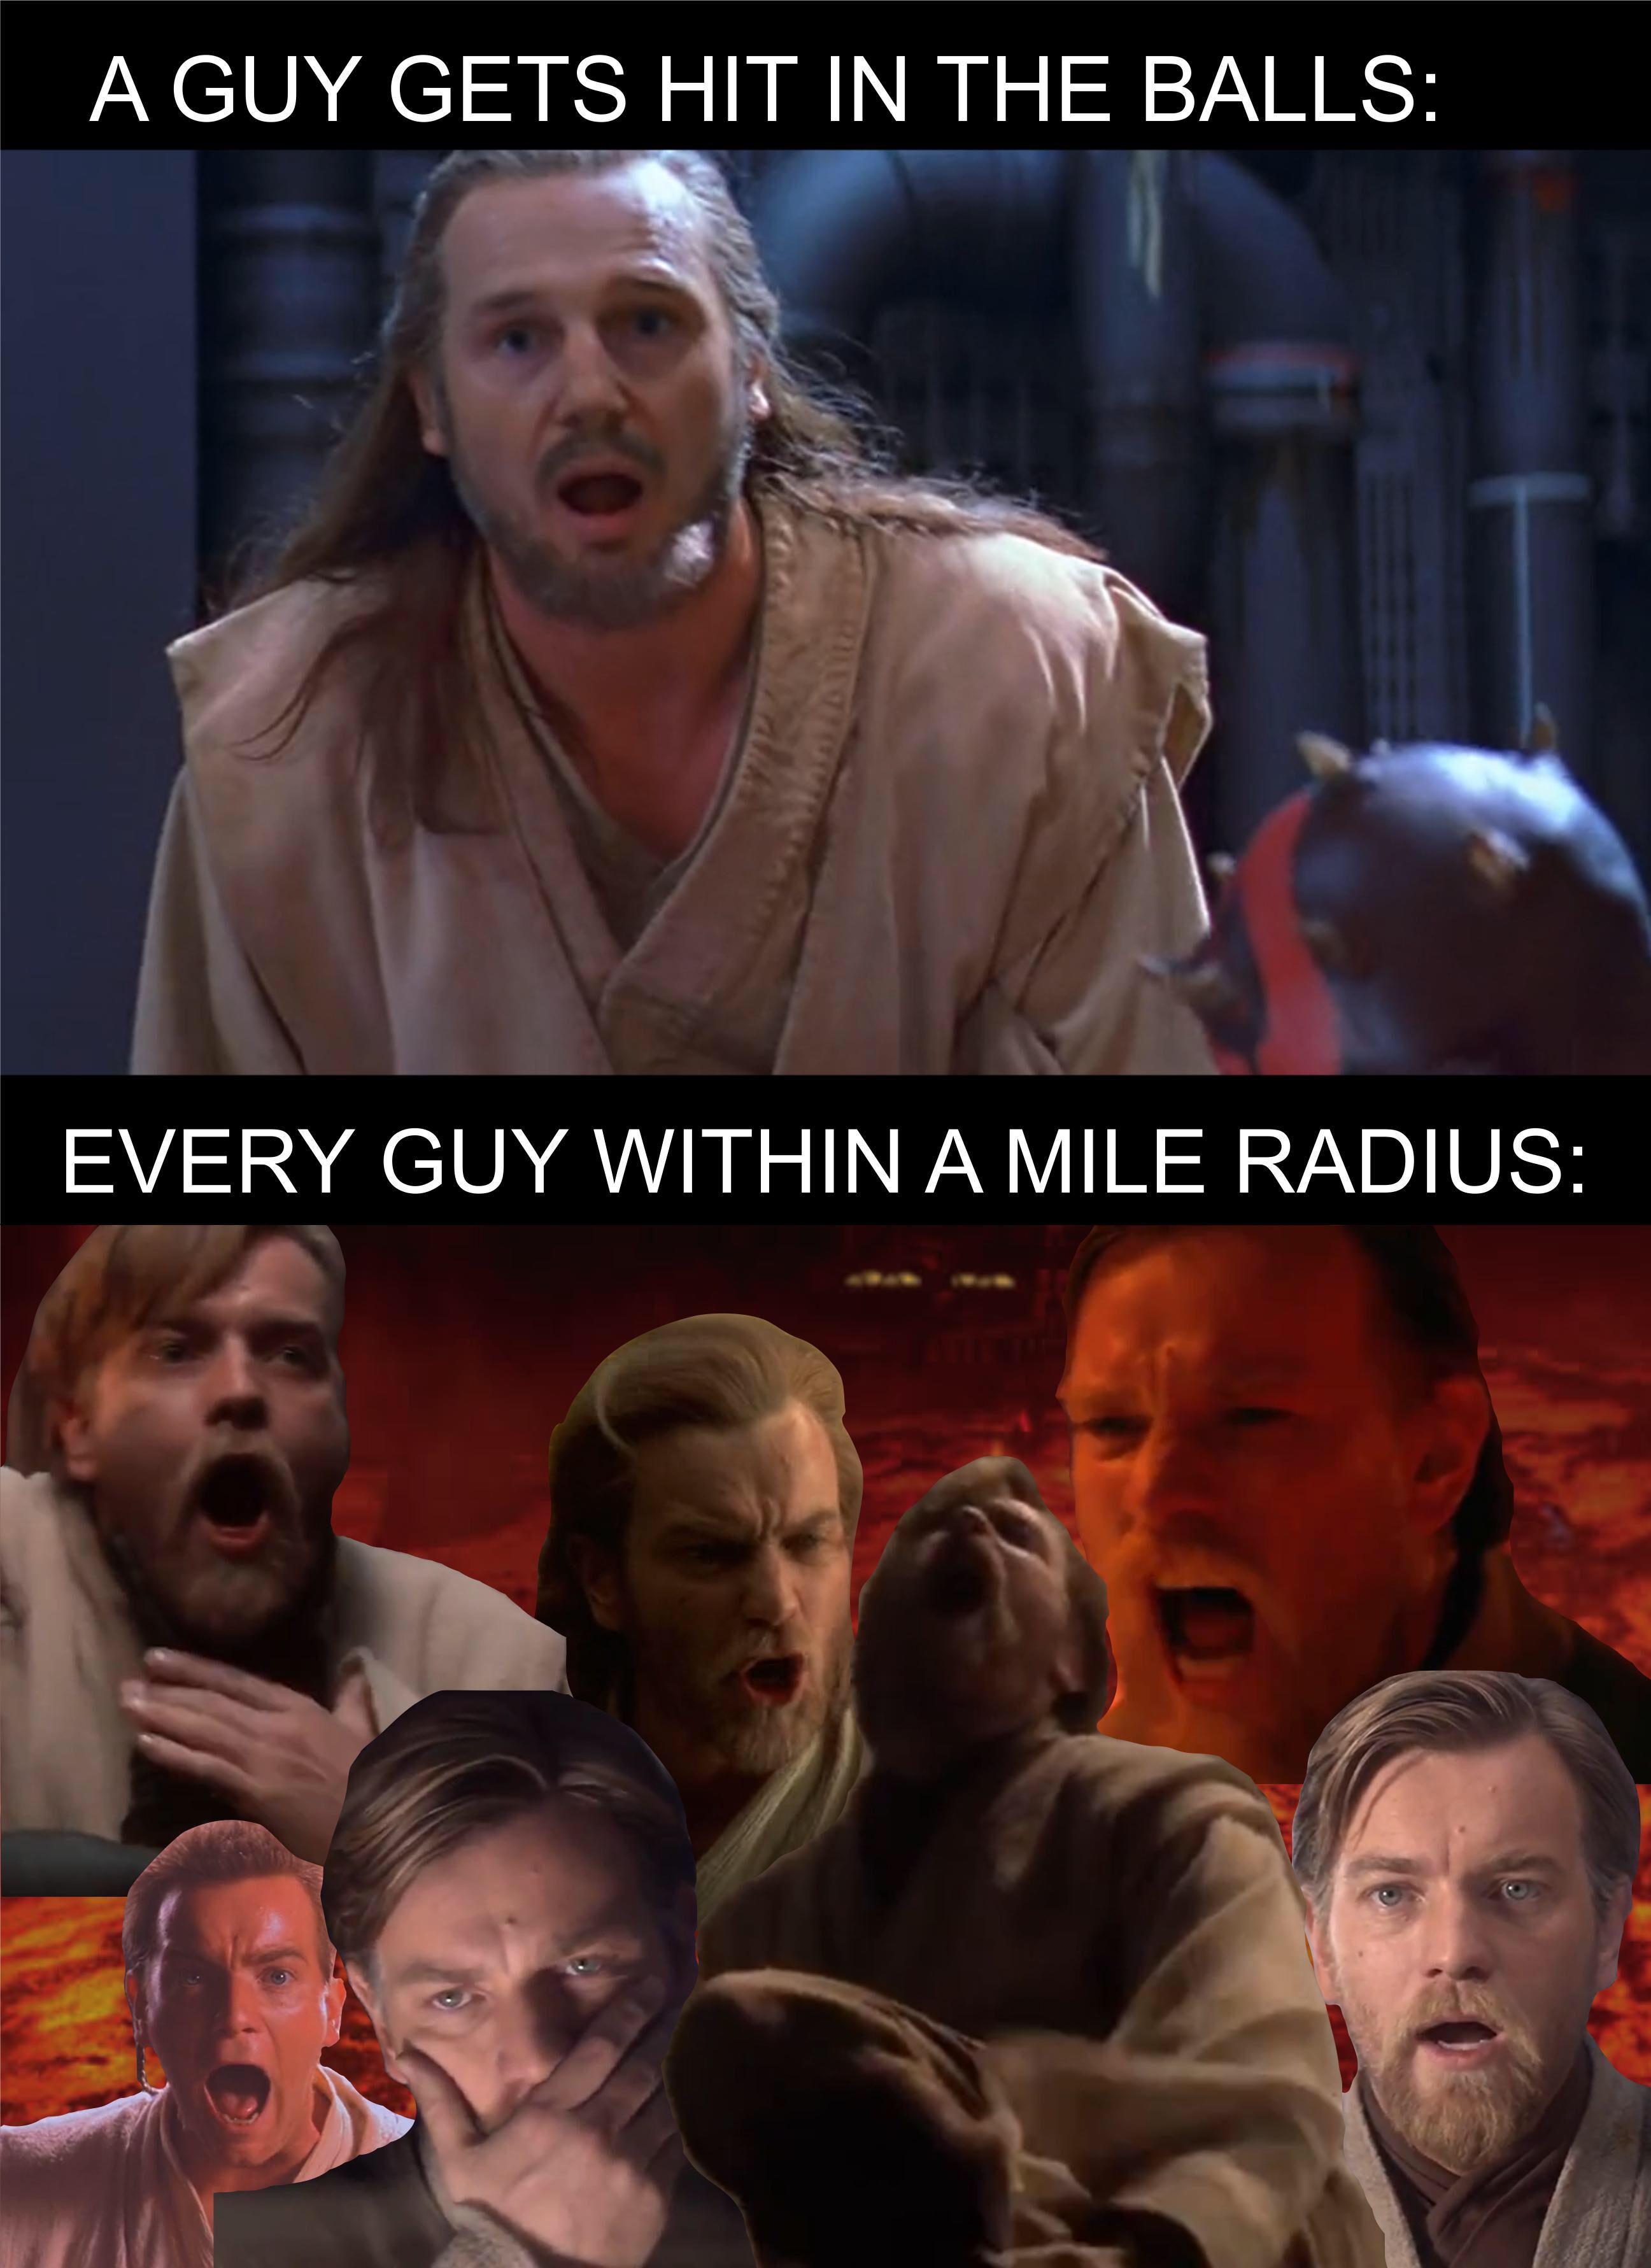 Pin By Tracys Jaxs On 2019 Memes Funny Star Wars Memes Star Wars Humor Star Wars Jokes